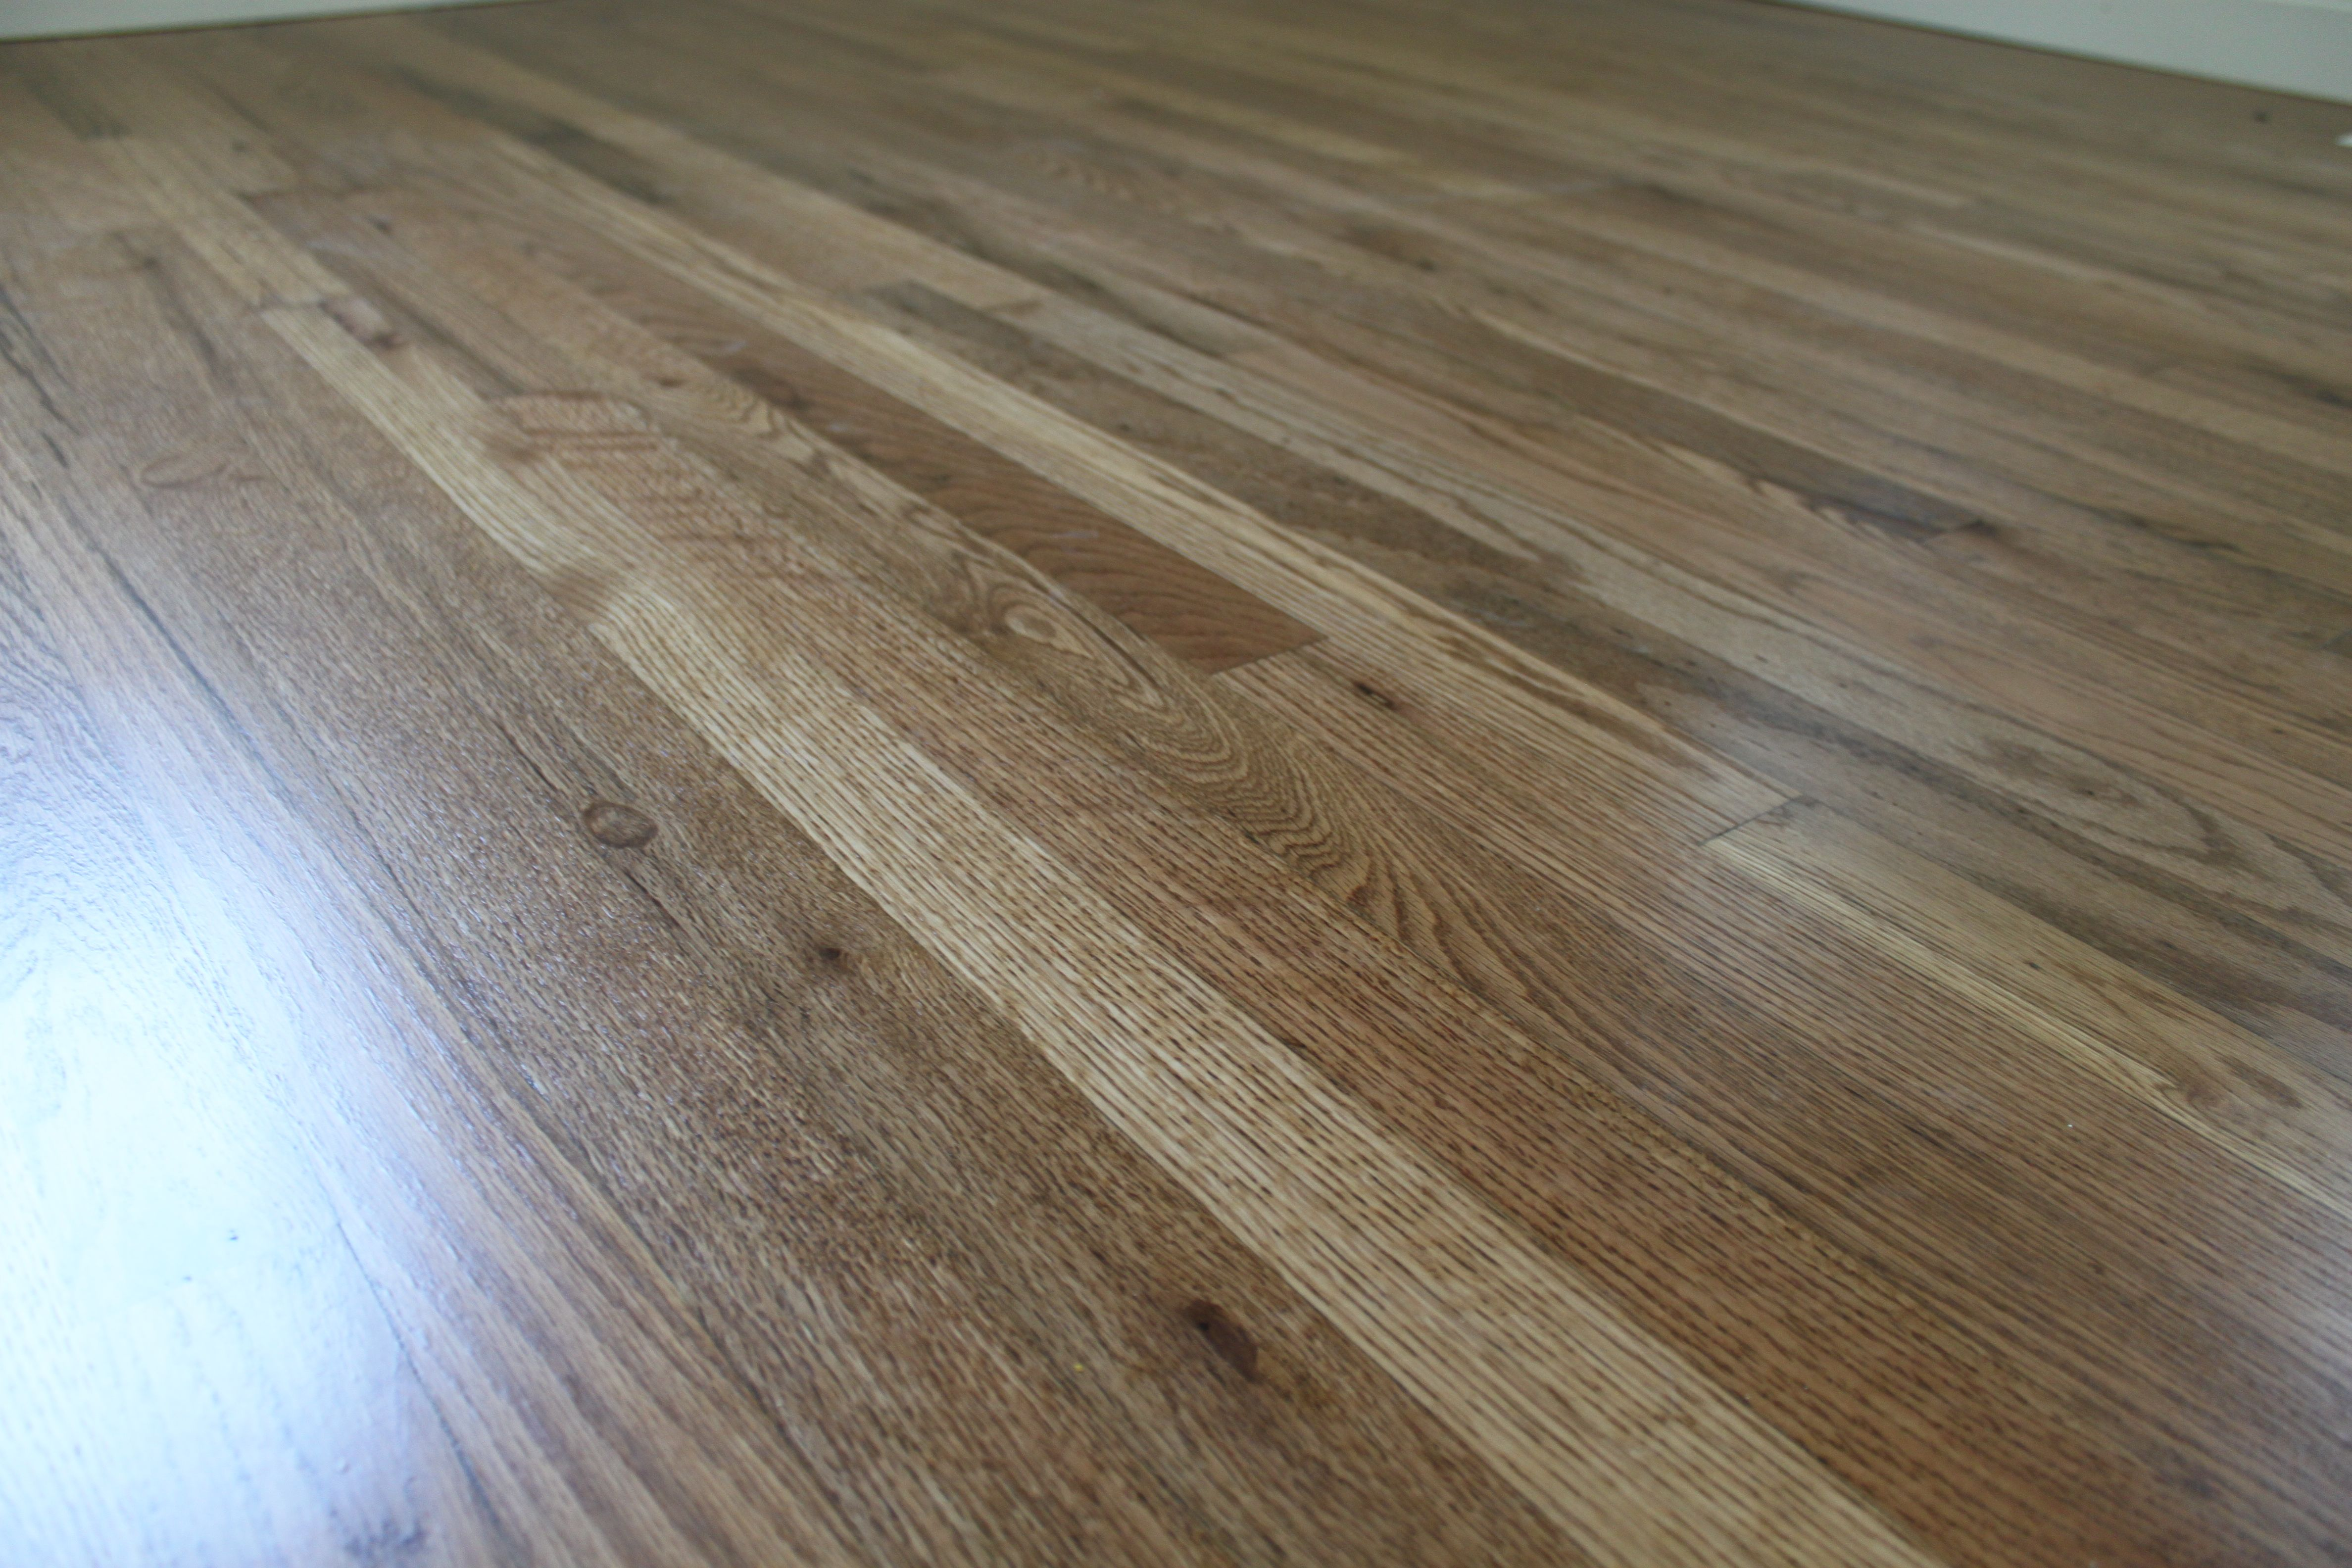 Red Oak Hardwood Floor Stained Floors Stains